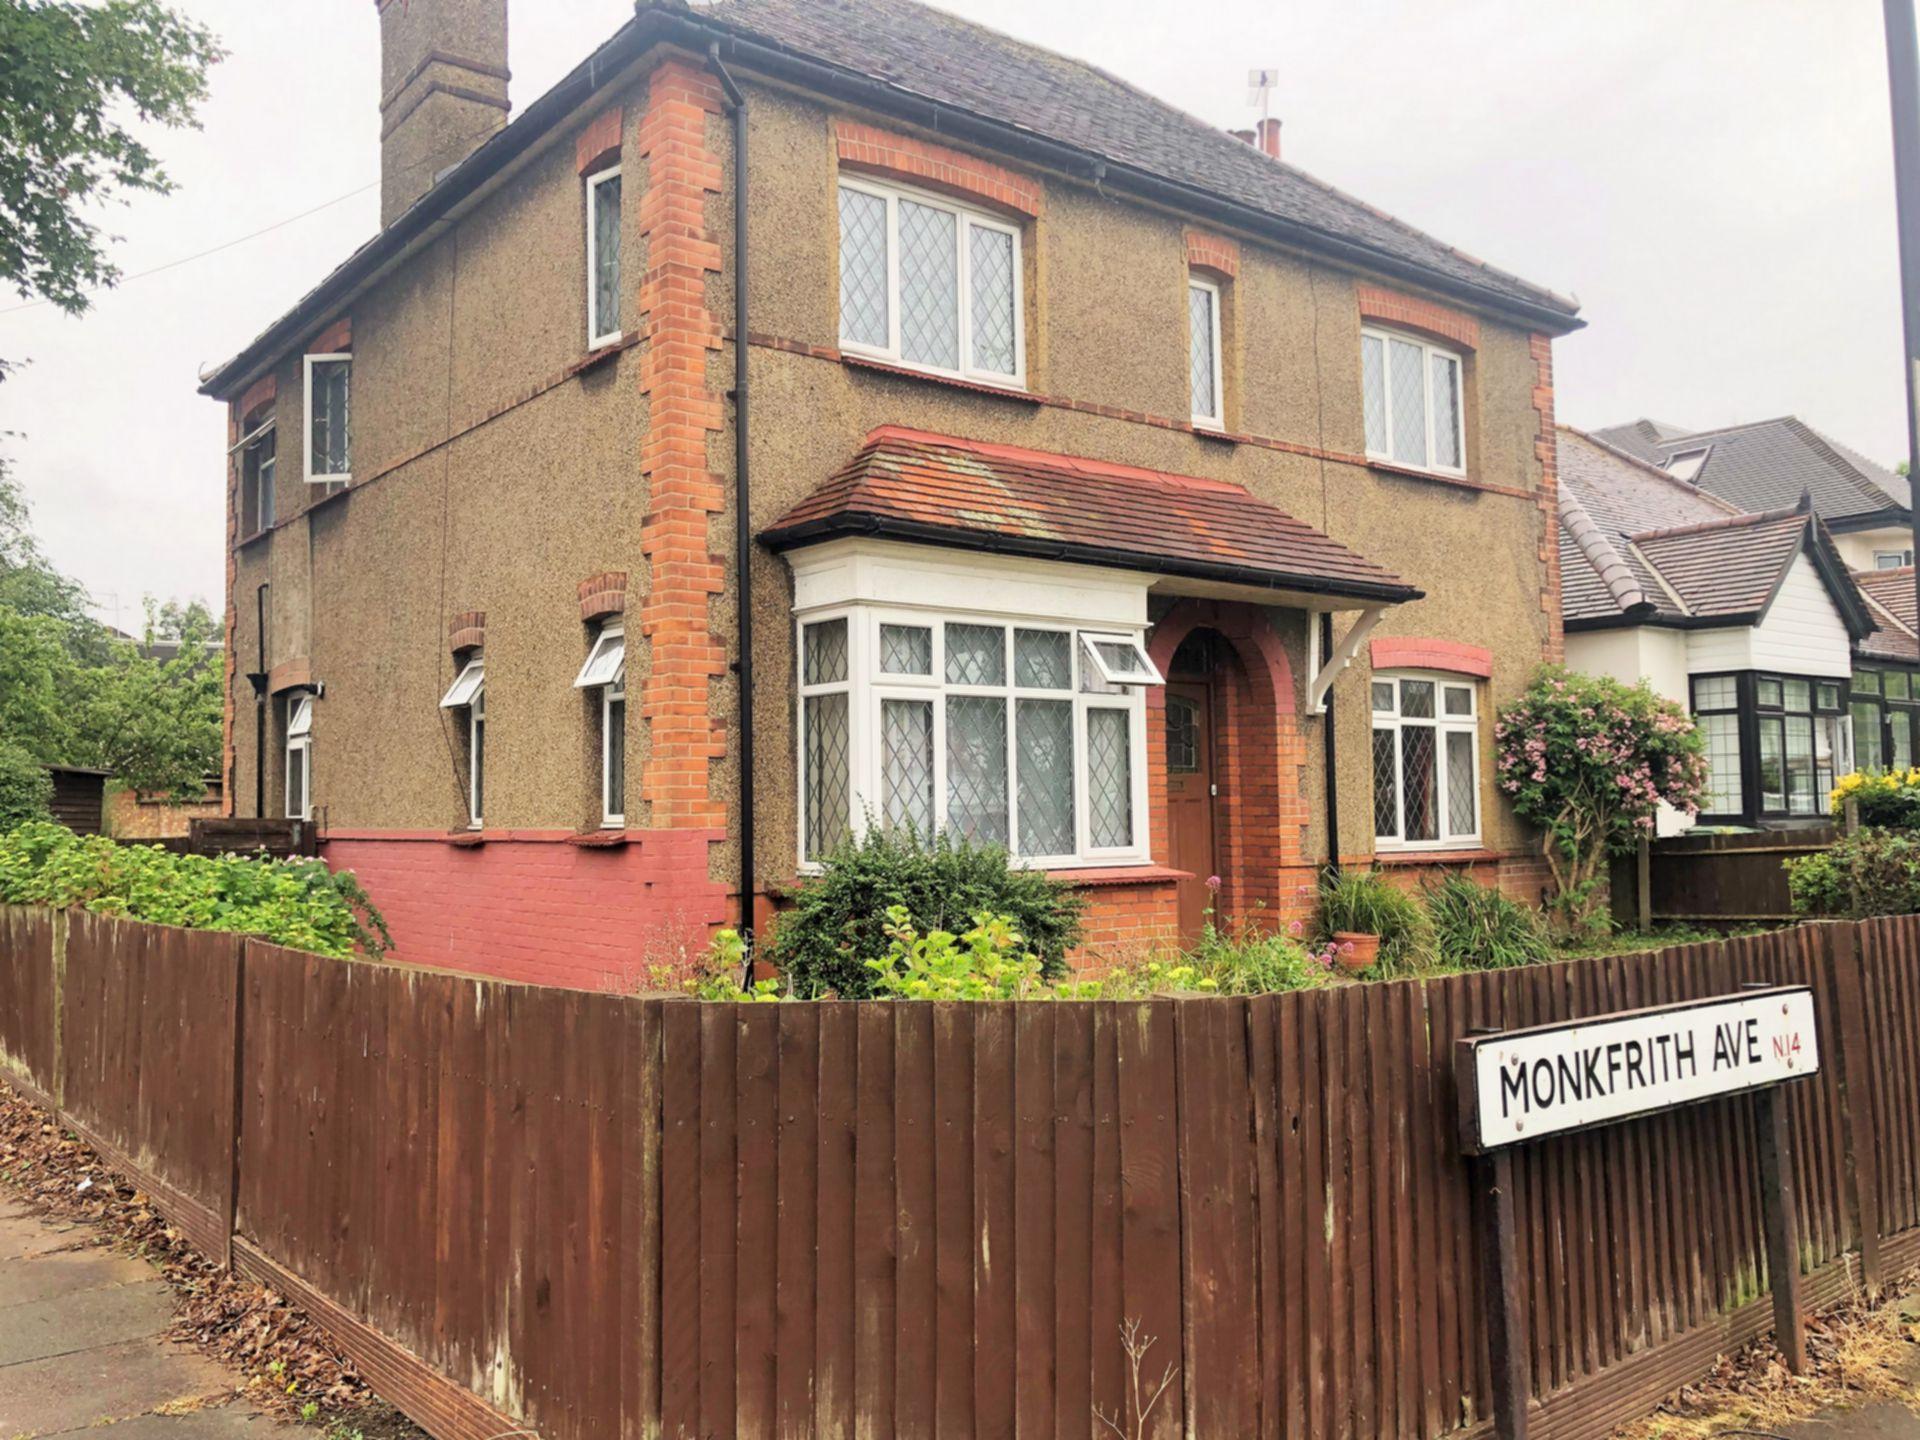 Monkfrith Avenue  Southgate  N14